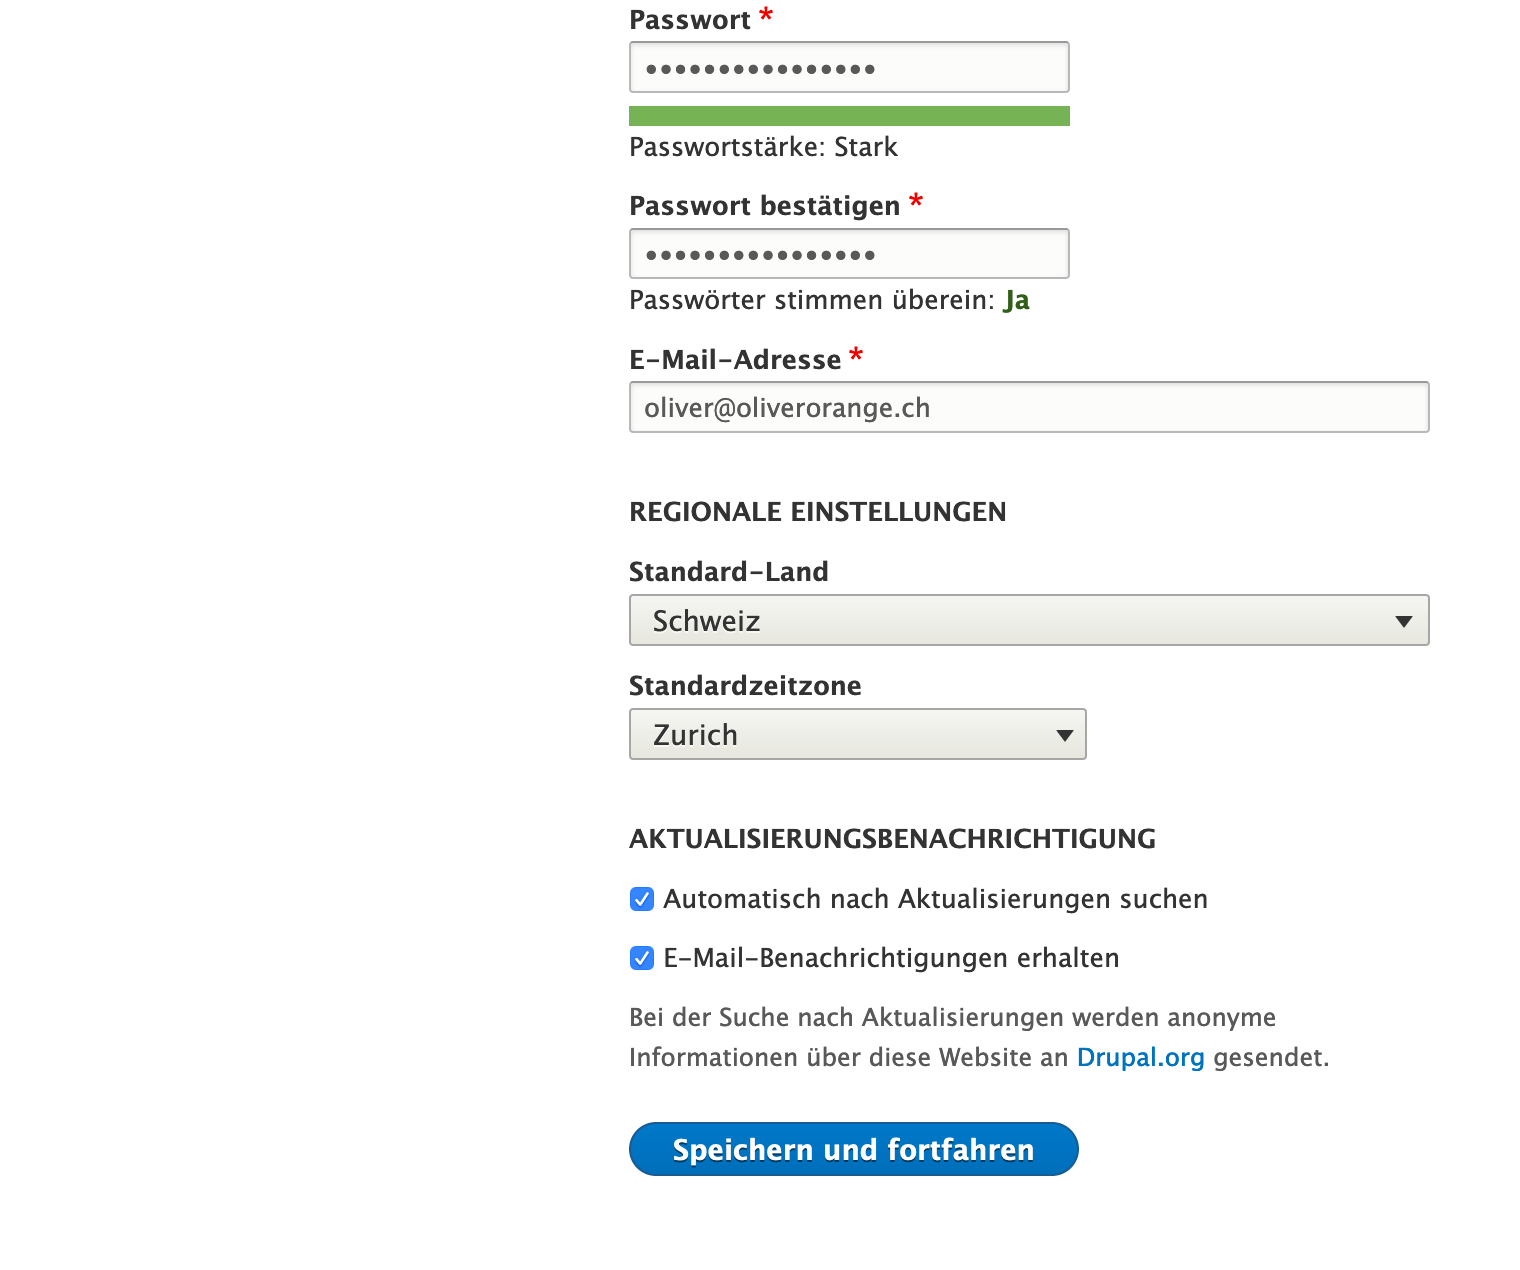 Konfiguration der Website